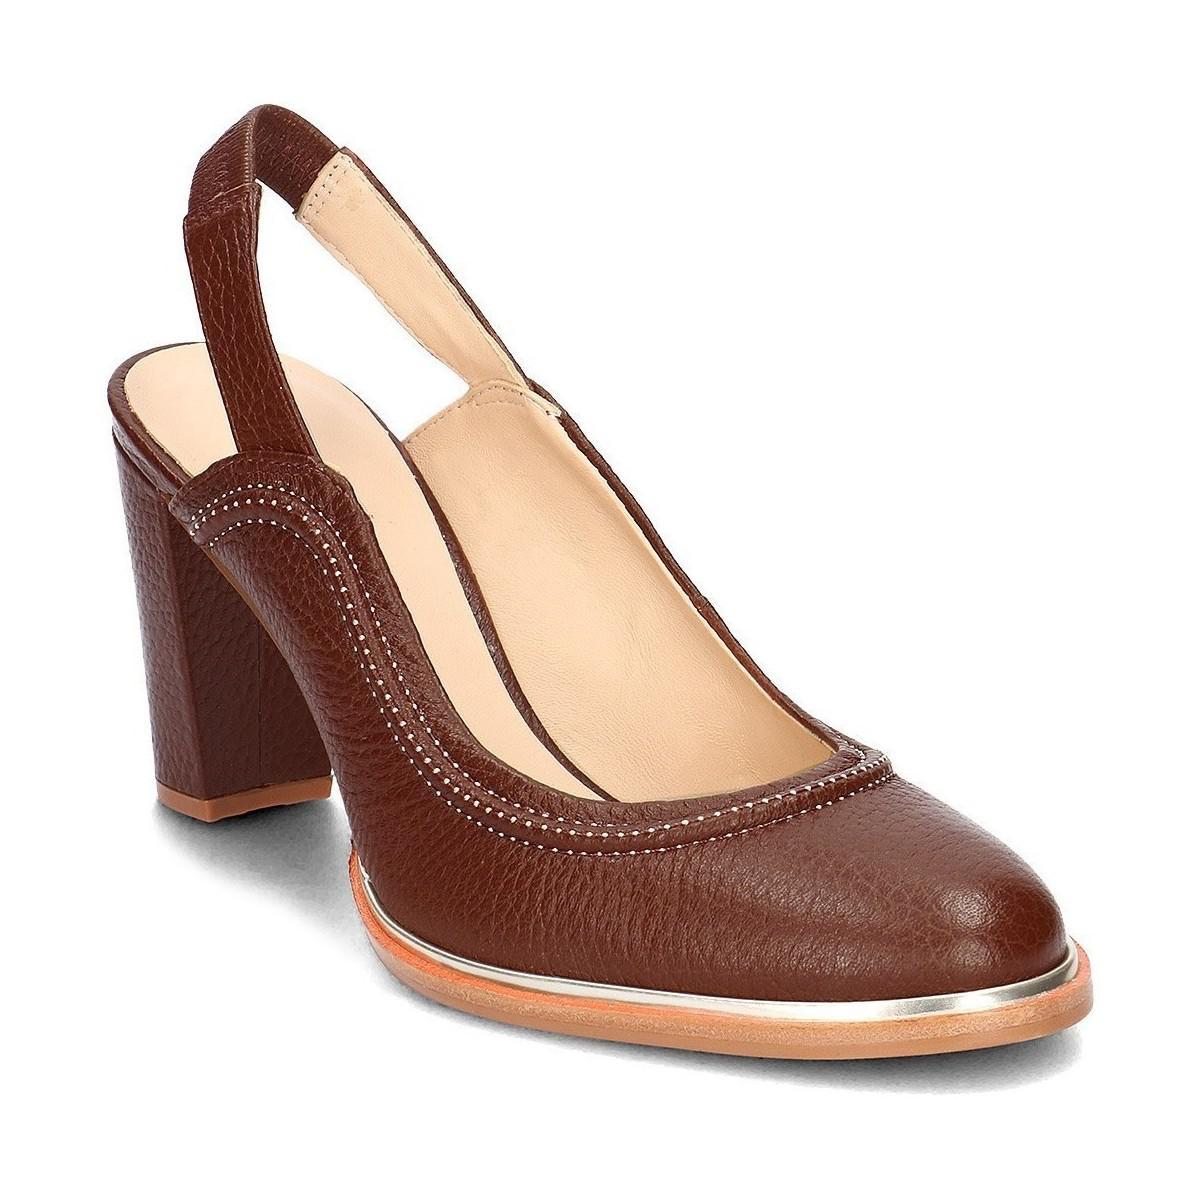 eef952f27fe9 Lyst - Ellis Ivy femmes Chaussures escarpins en Marron Clarks en ...